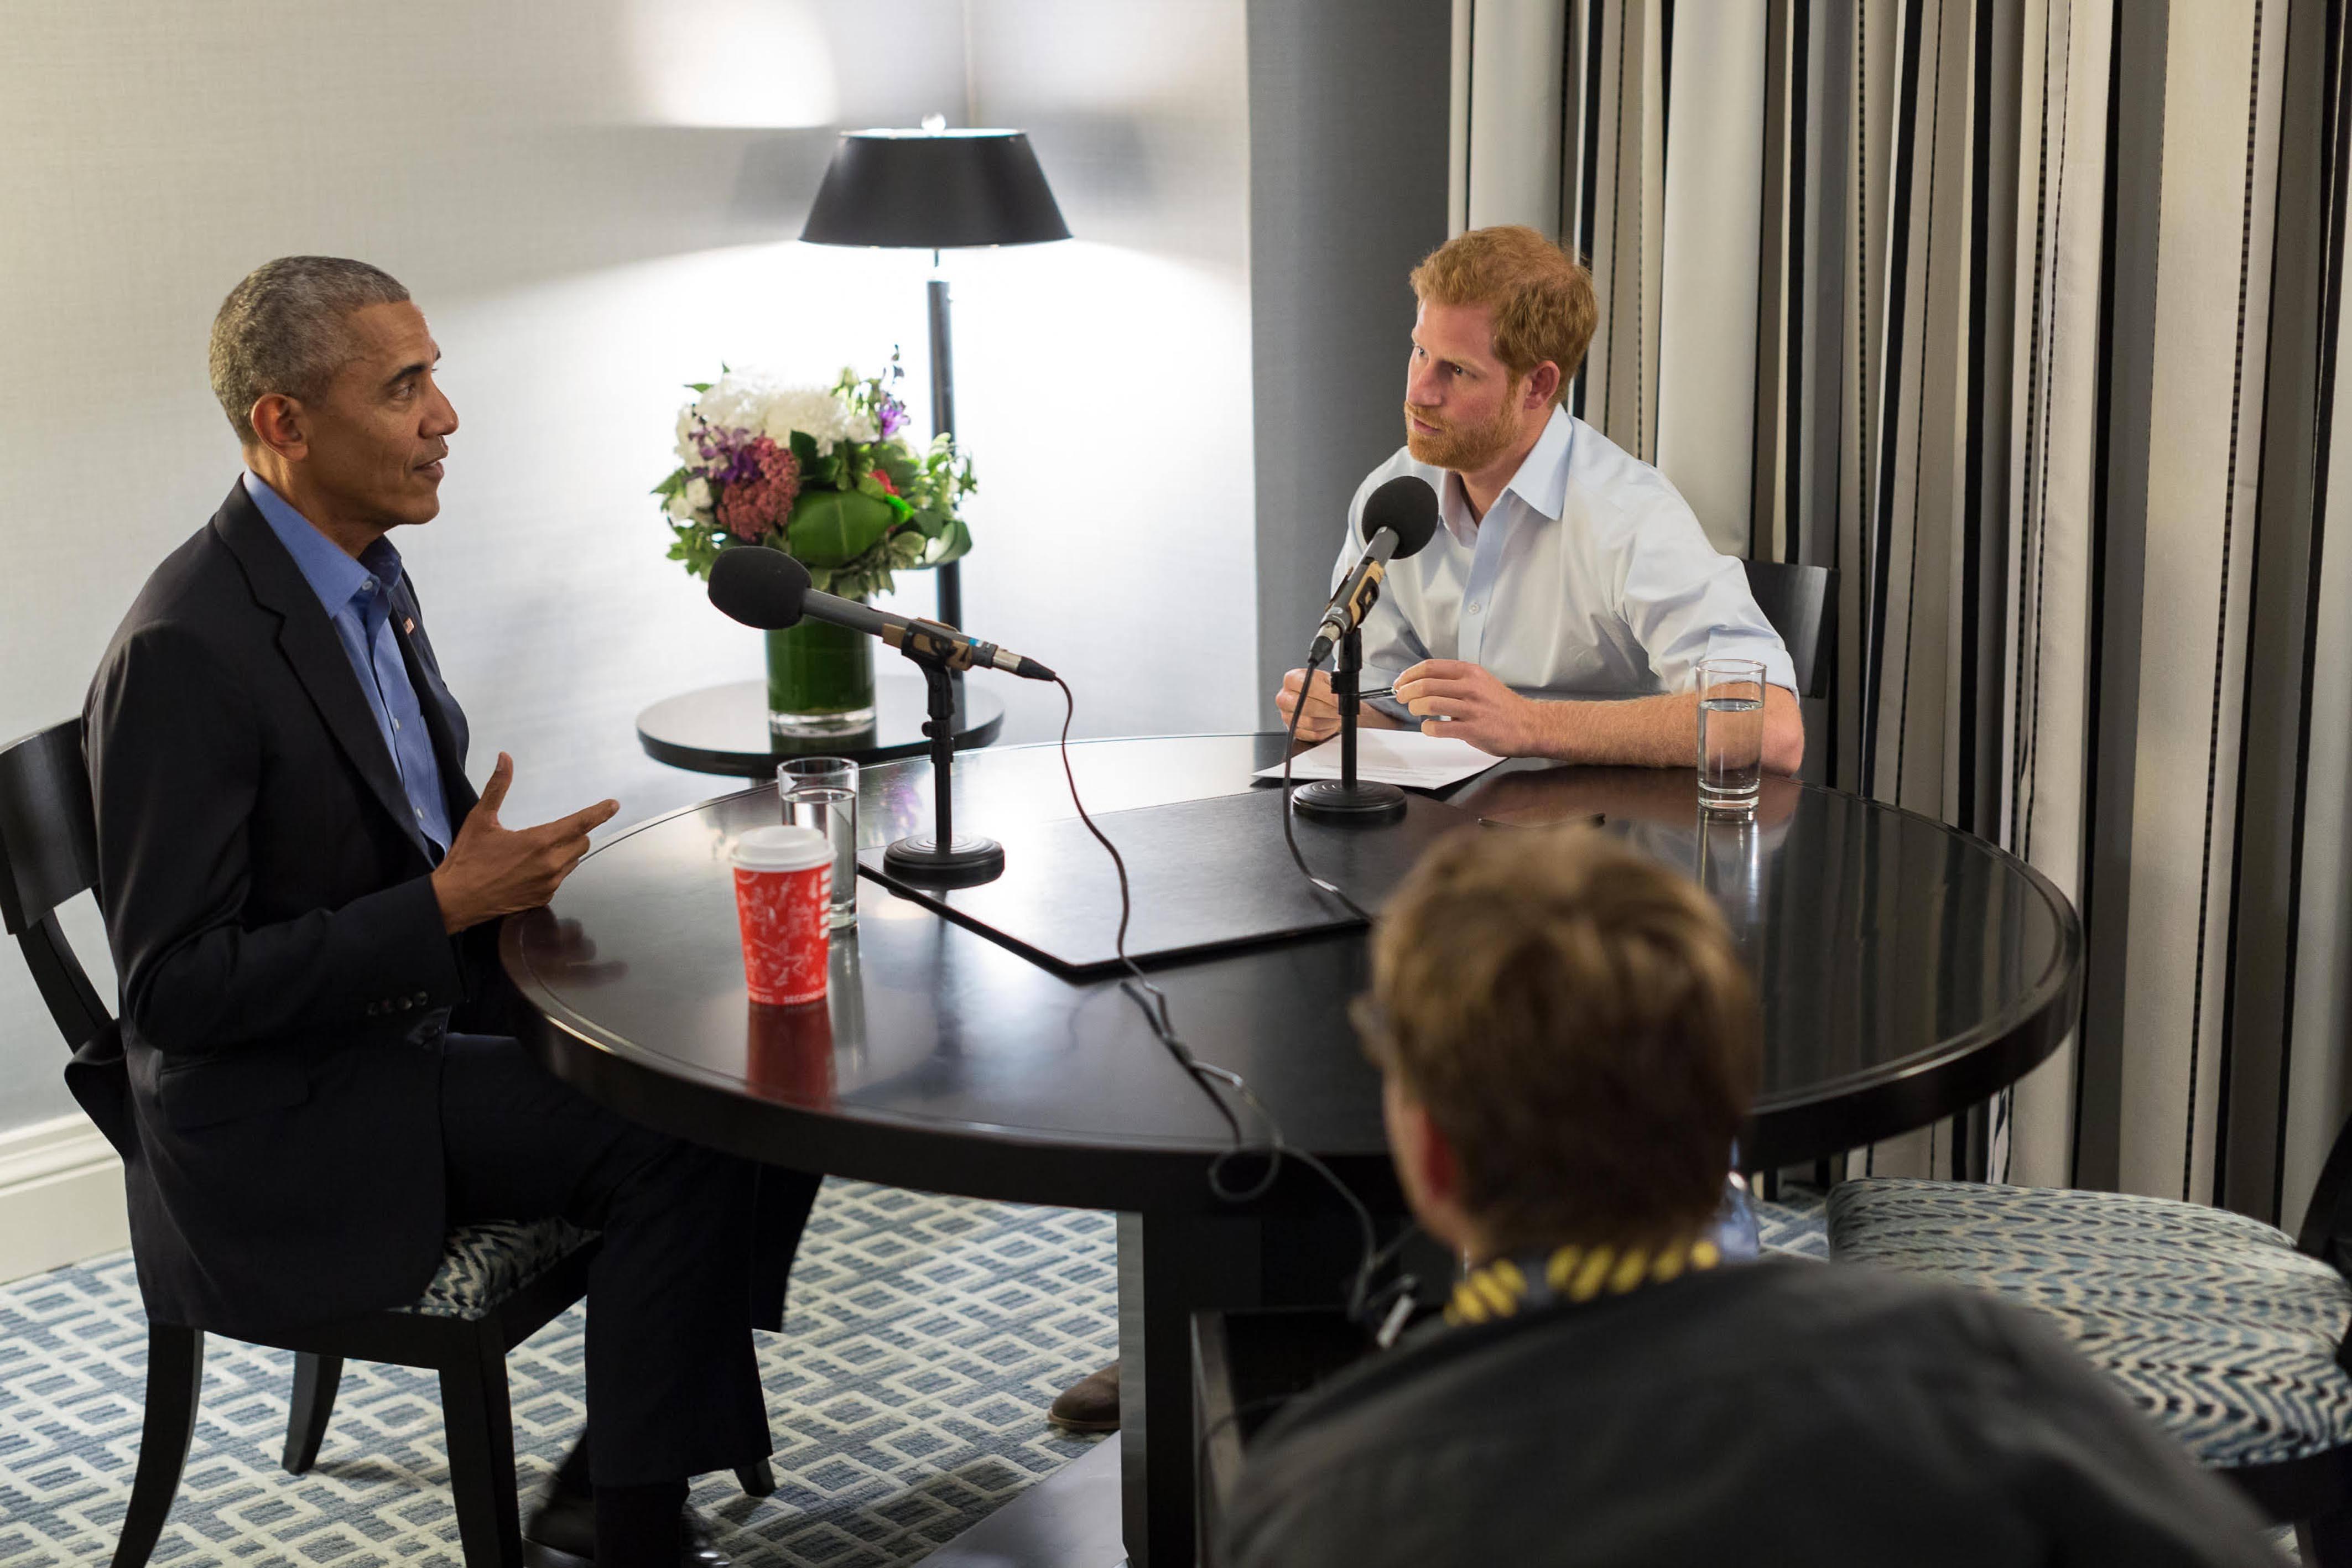 Prince Harry interviews former US President Barack Obama as